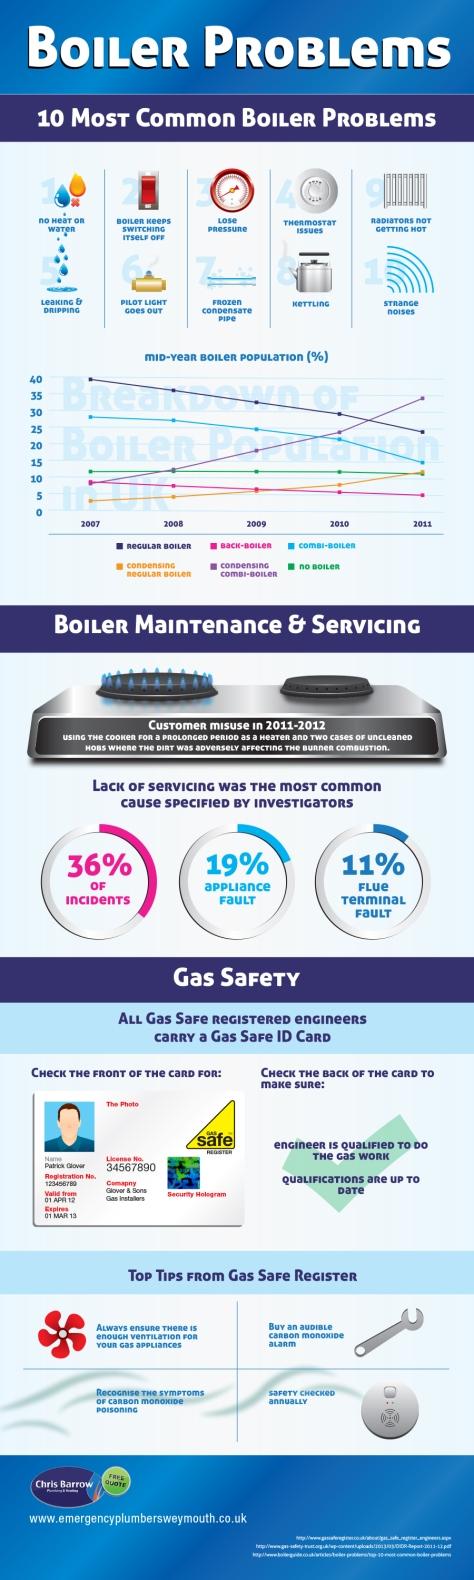 Boiler Problems 10 Most Common Boiler problems